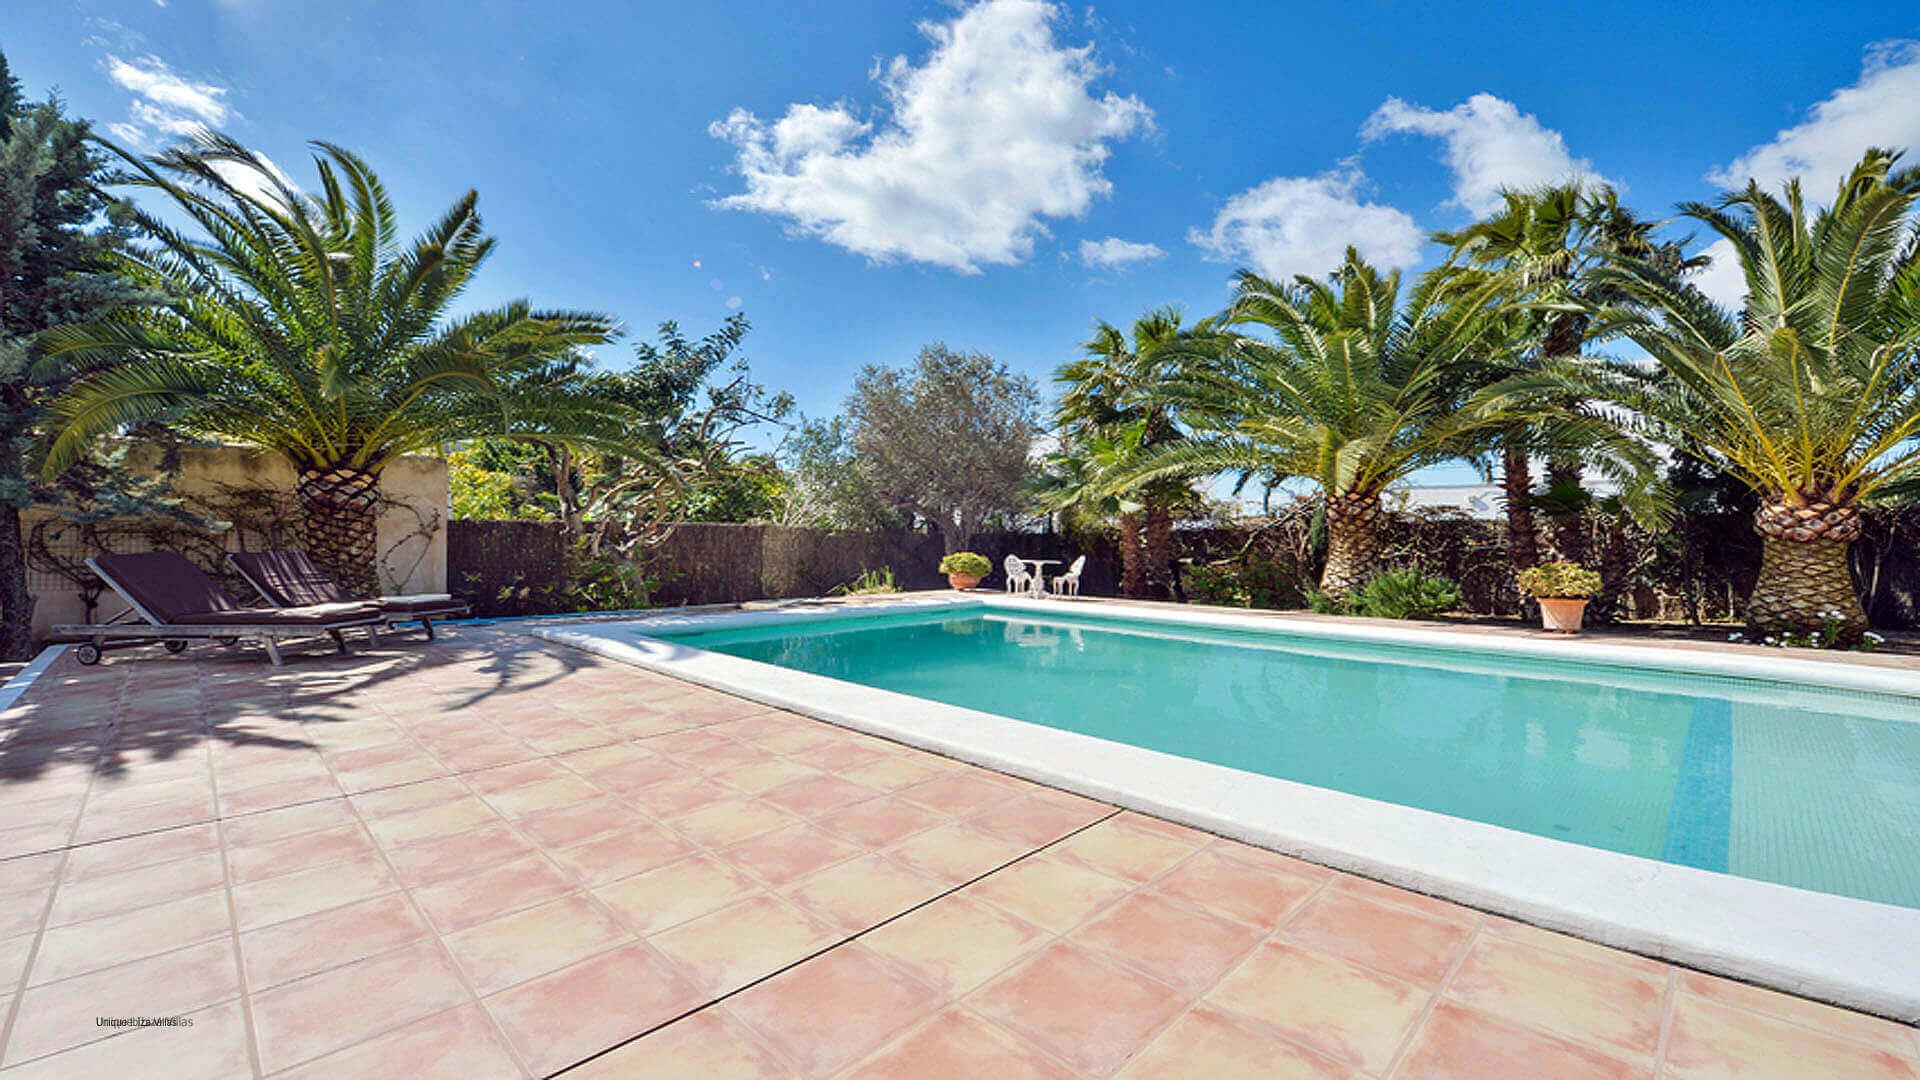 Villa Jaume Dalt Ibiza 3 Playa Den Bossa